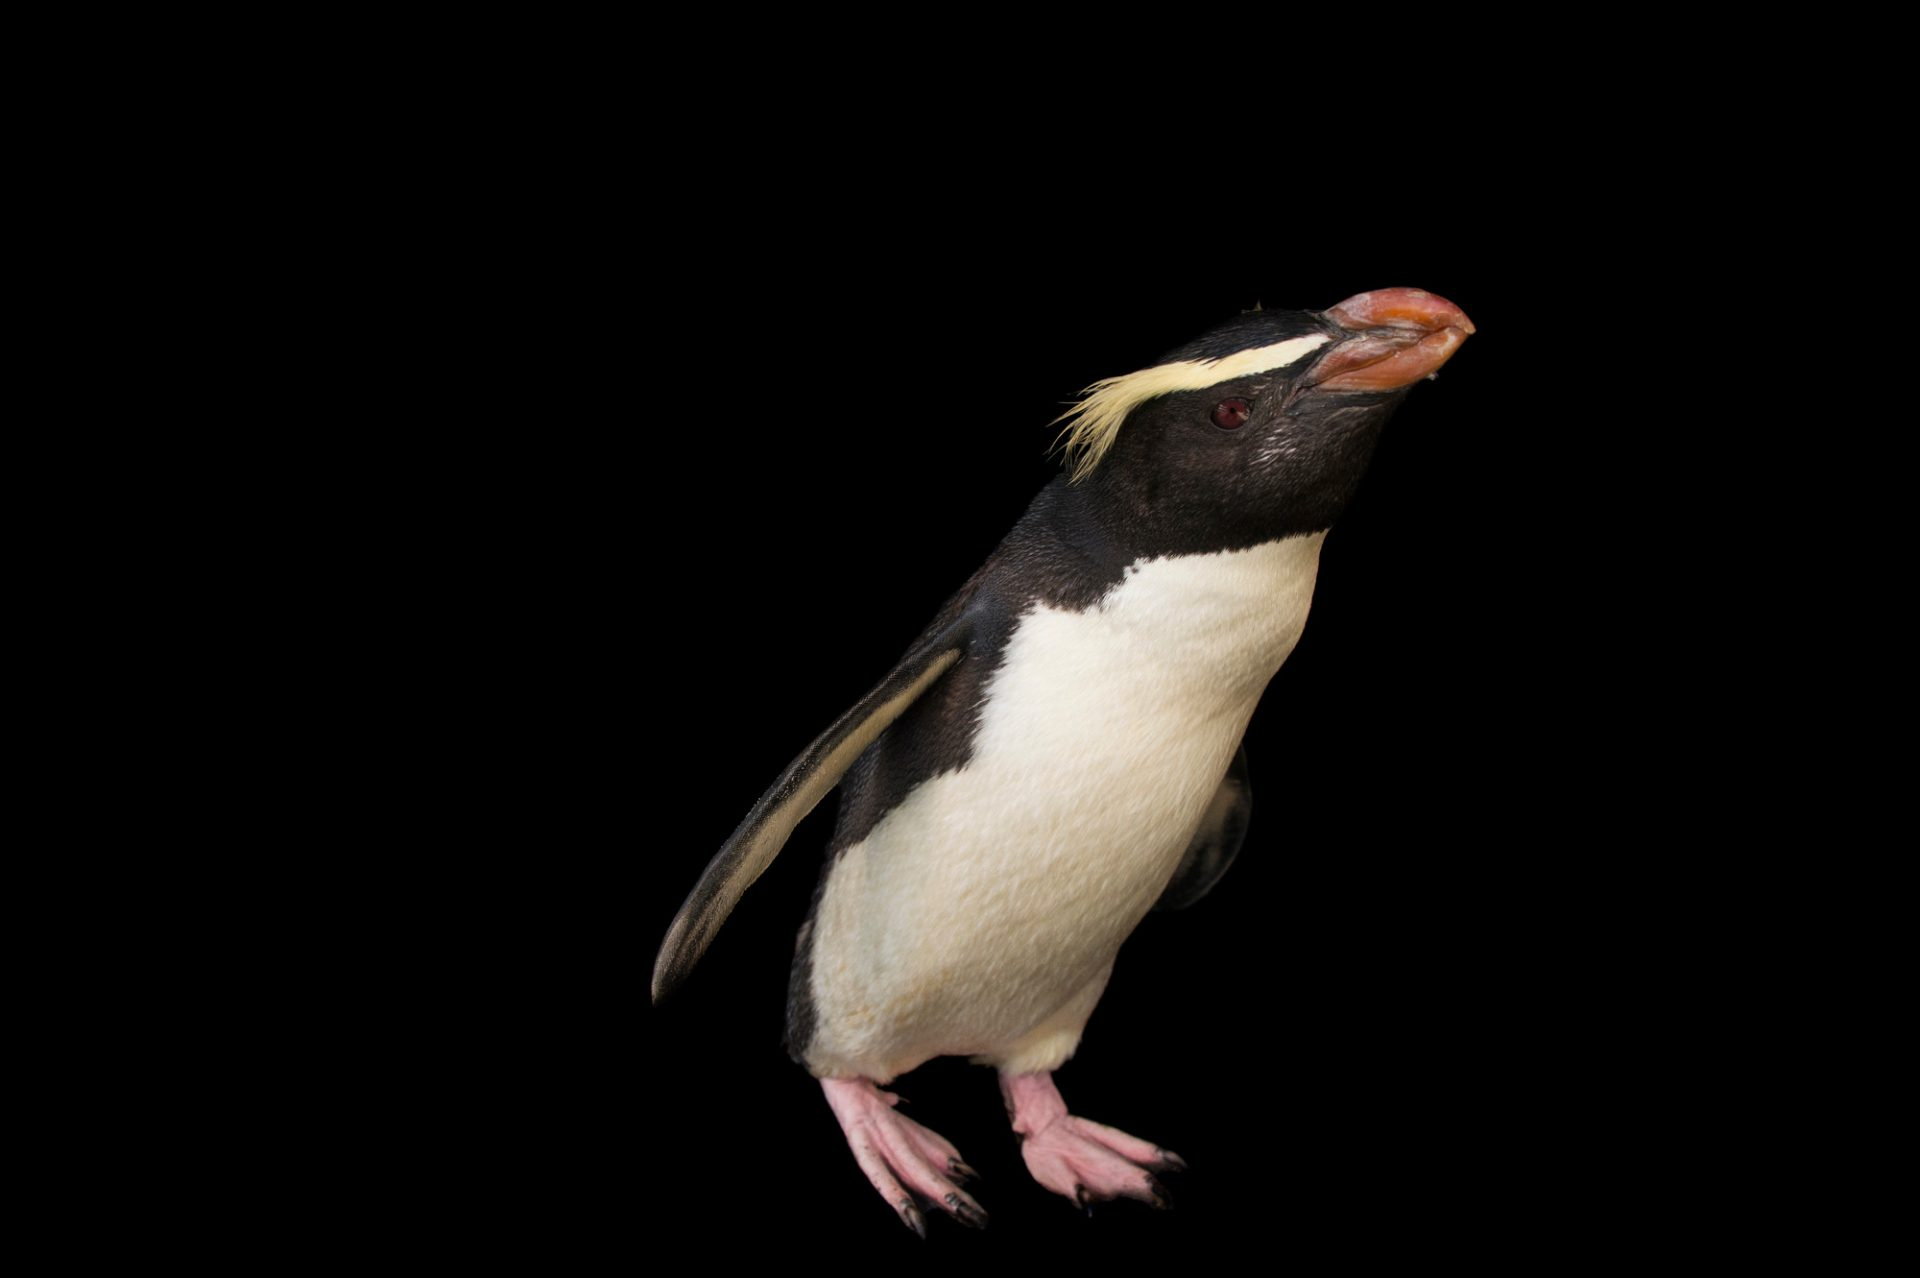 Photo: A vulnerable Fiordland penguin (Eudyptes pachyrhynchus) Fiordland penguin at the Taronga Zoo.